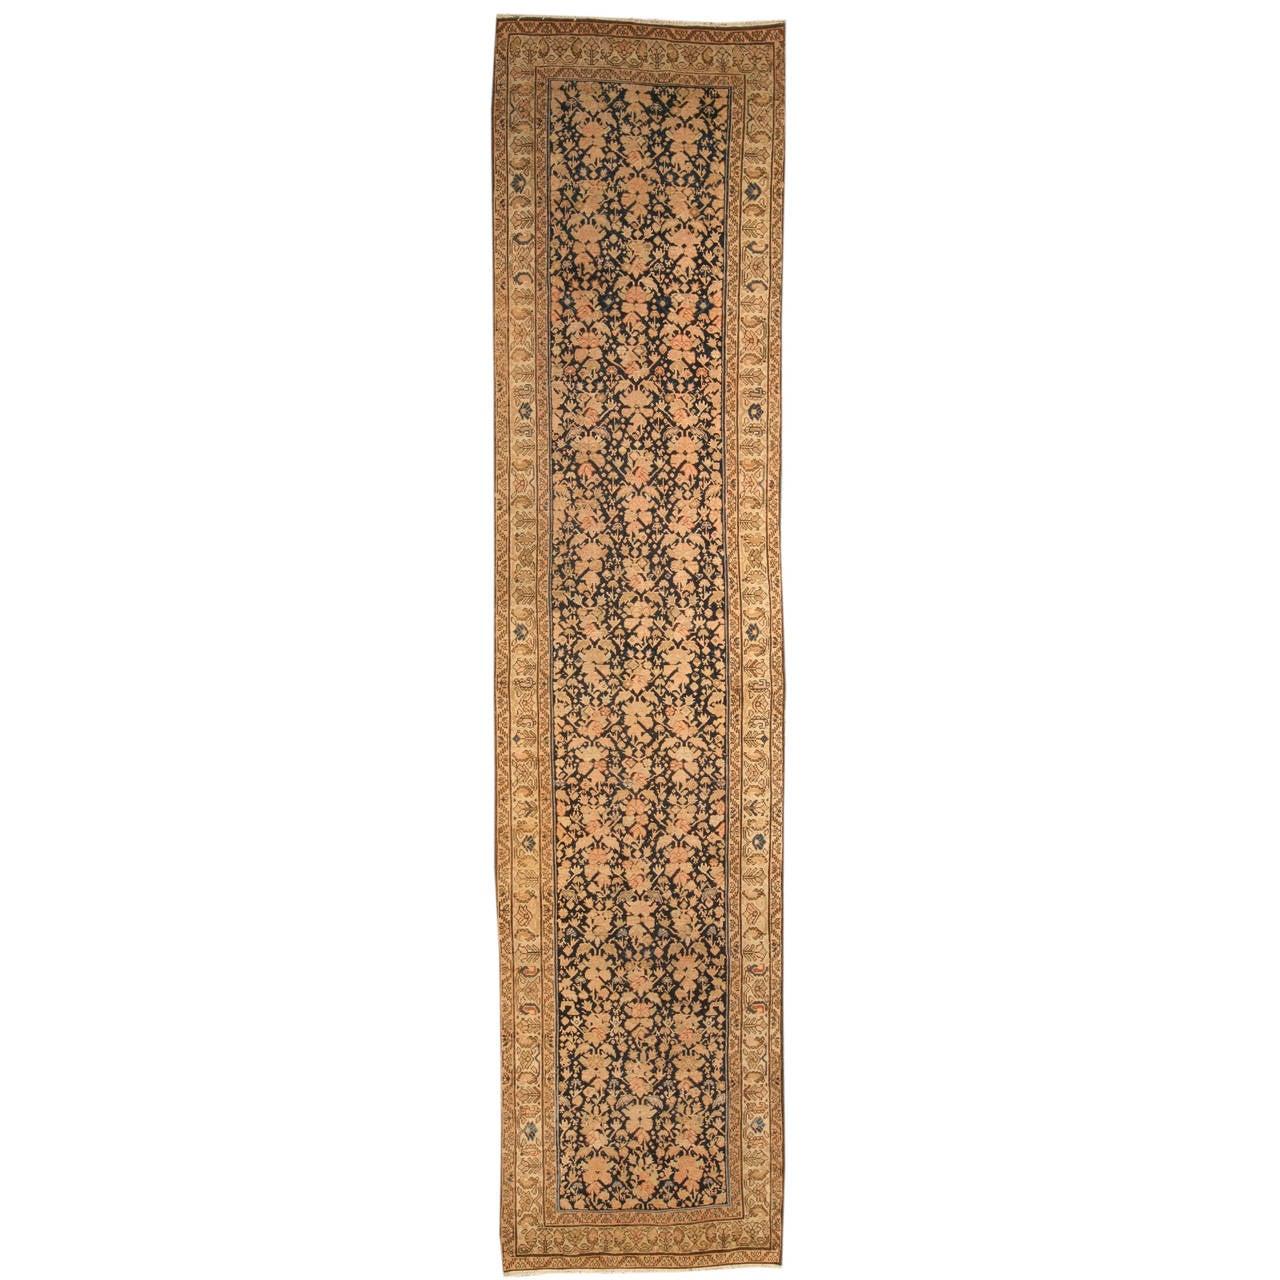 Antique Persian Malayer Runner Rug